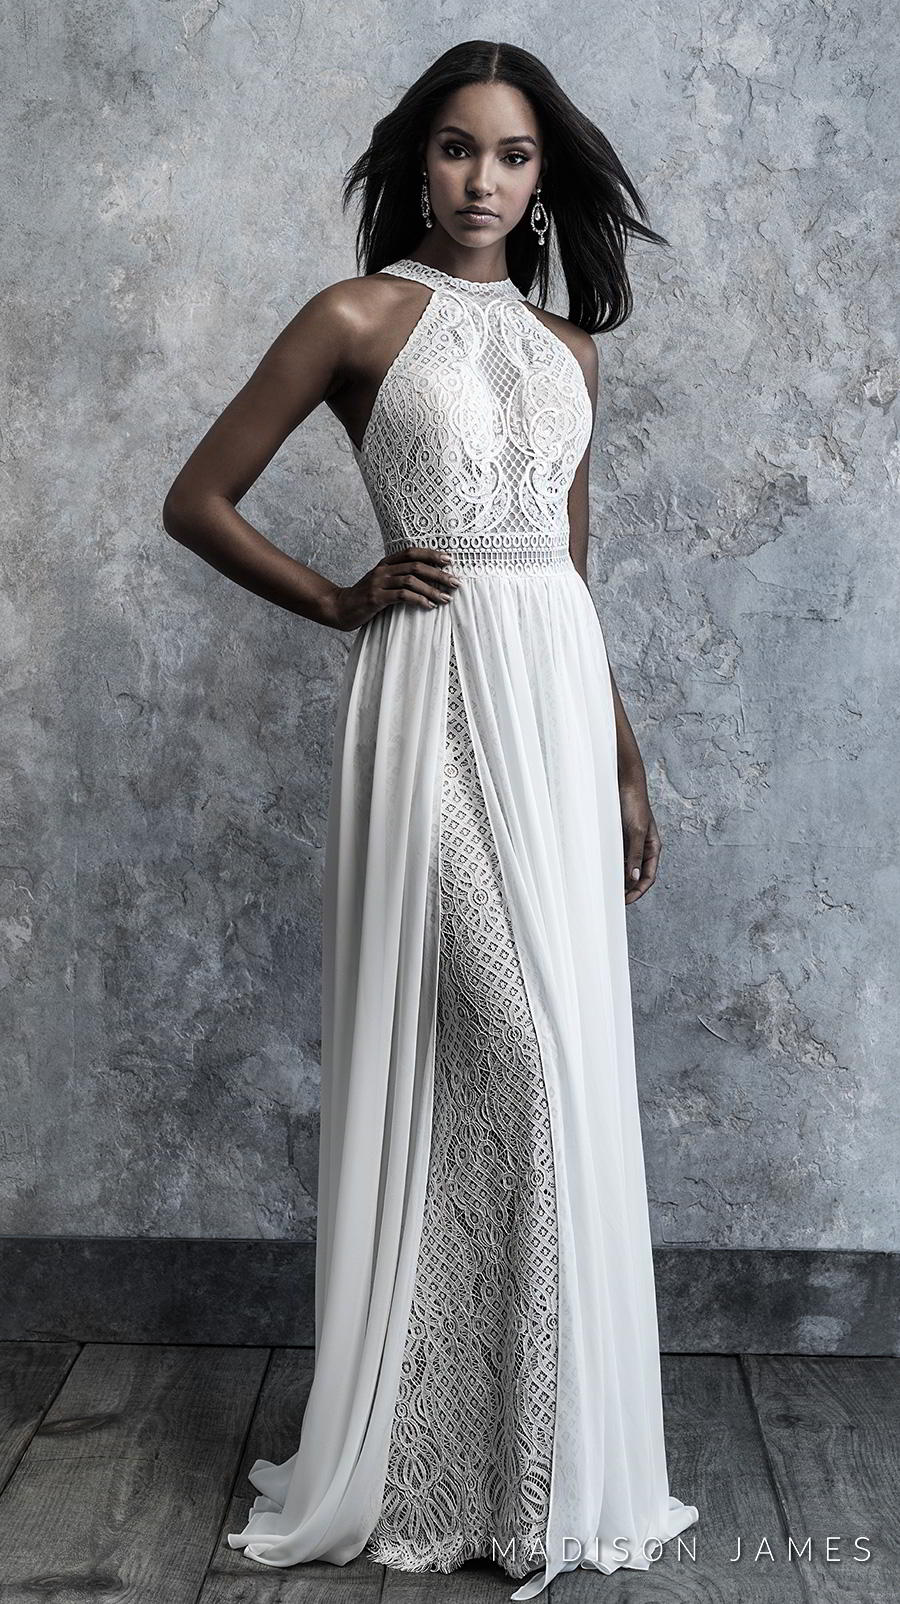 madison james 2019 bridal sleeveless halter neck full embellishment elegant grecian sheath wedding dress a line overskirt covered lace back chapel train (512) mv